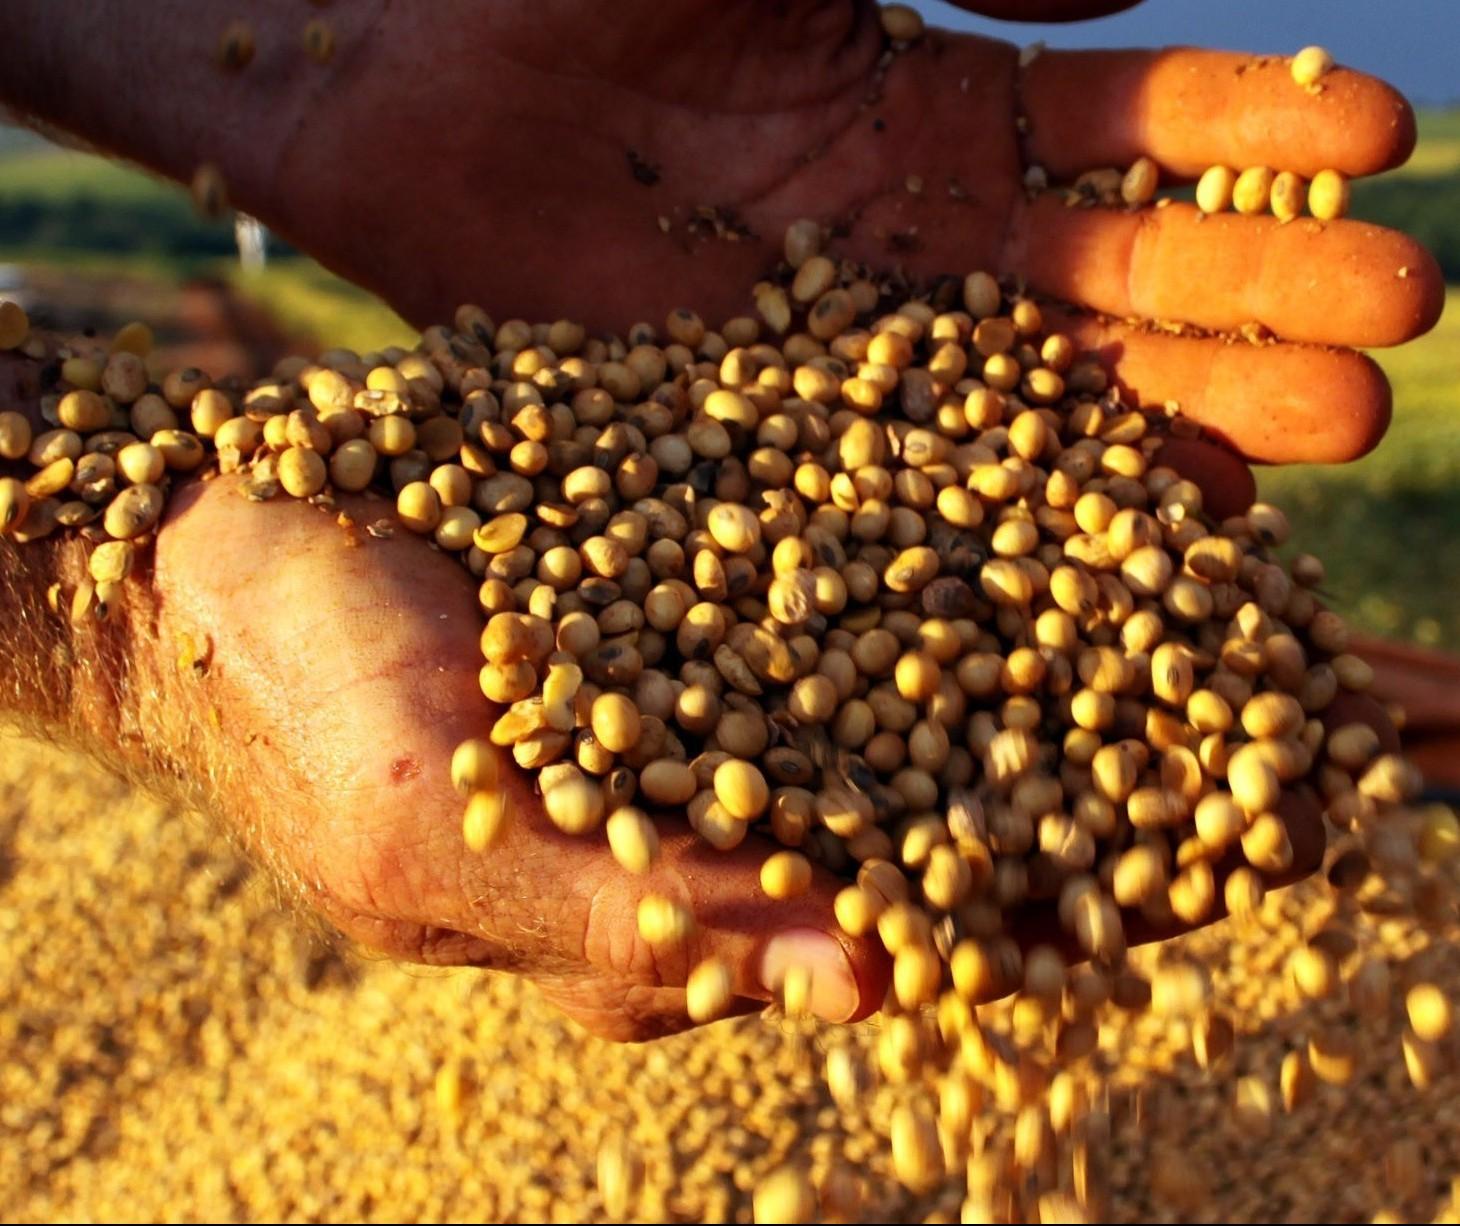 Soja custa R$ 74 a saca em Maringá